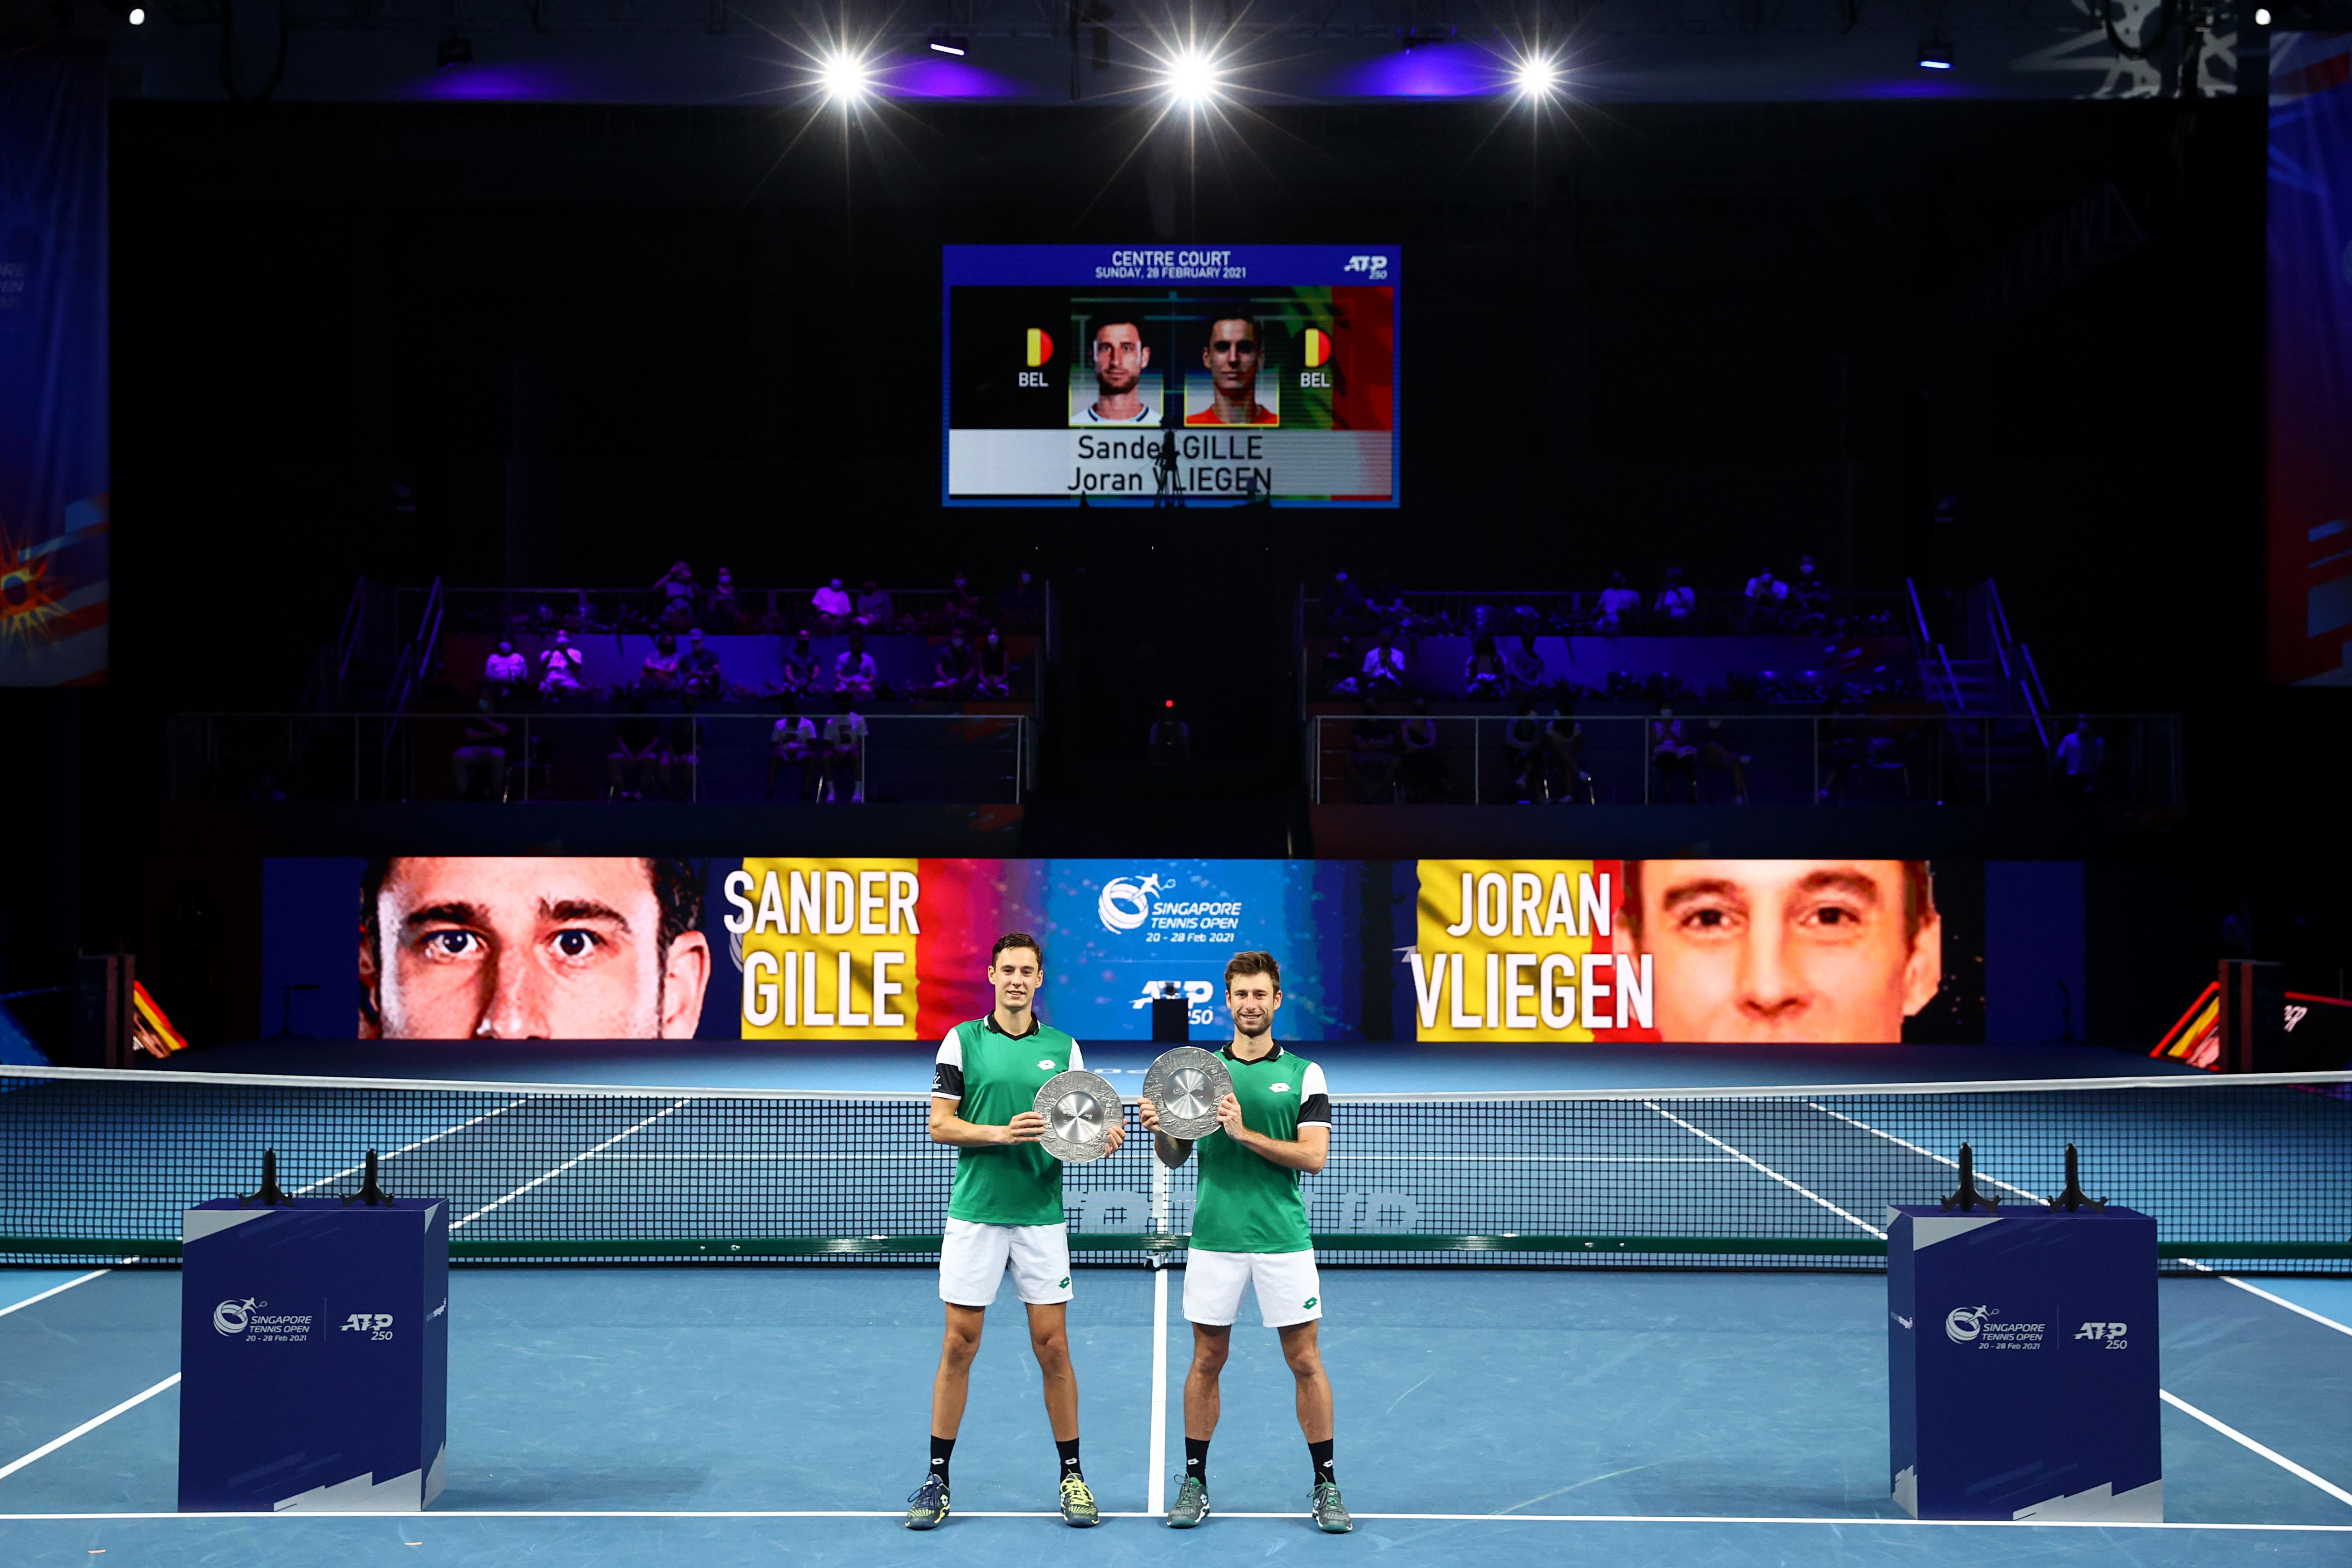 Sander Gillé & Joran Vliegen win STO Doubles Final in convincing fashion, for their 5th ATP Tour title!